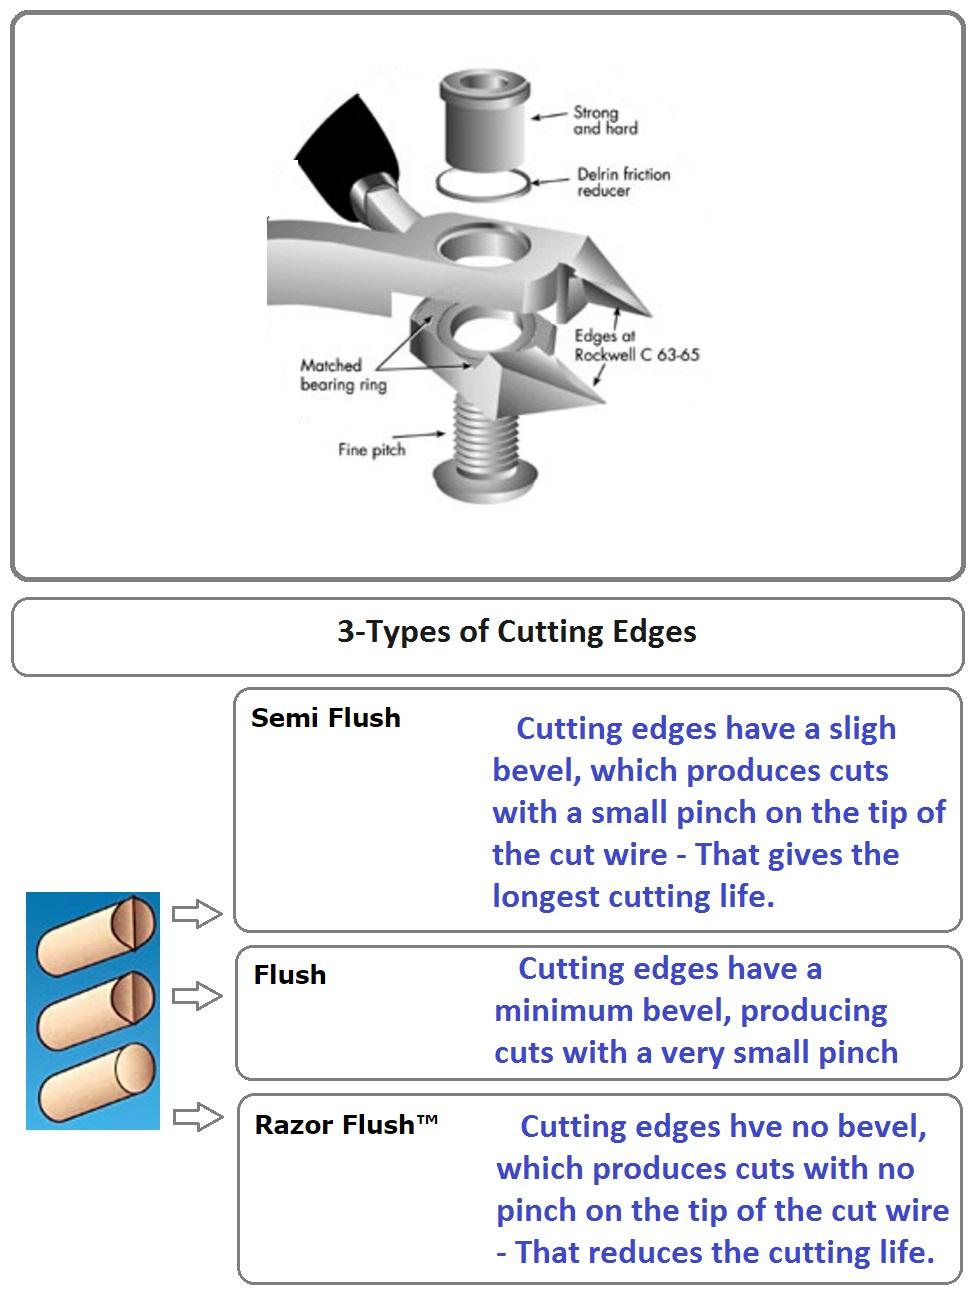 Inspectting-Mirror-Cutting-Tool-17-Hardware-Pro